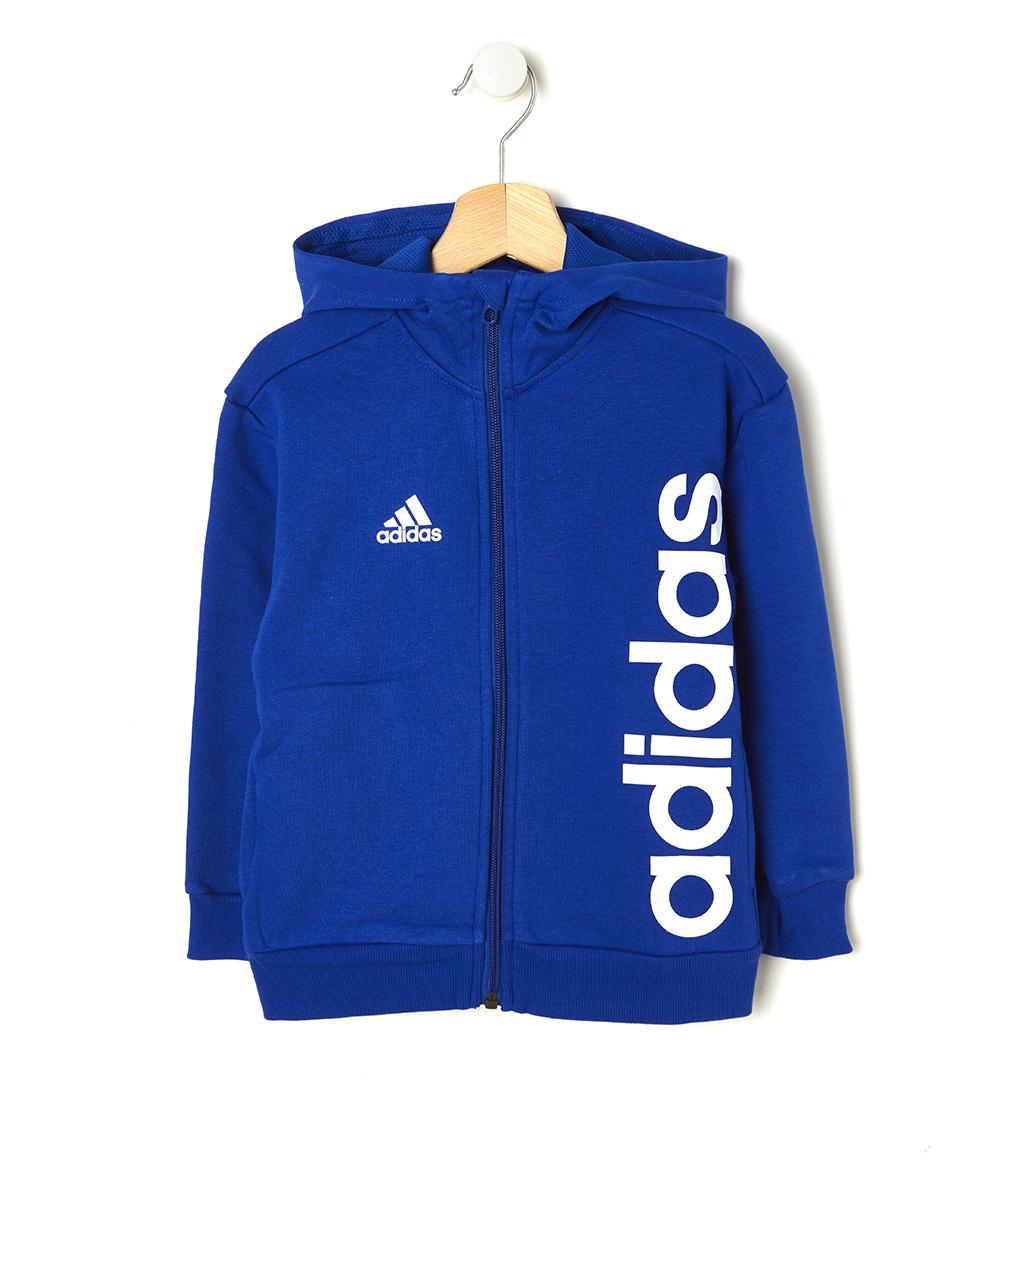 best service cc95d ad4c4 Felpa Adidas blu con cappuccio